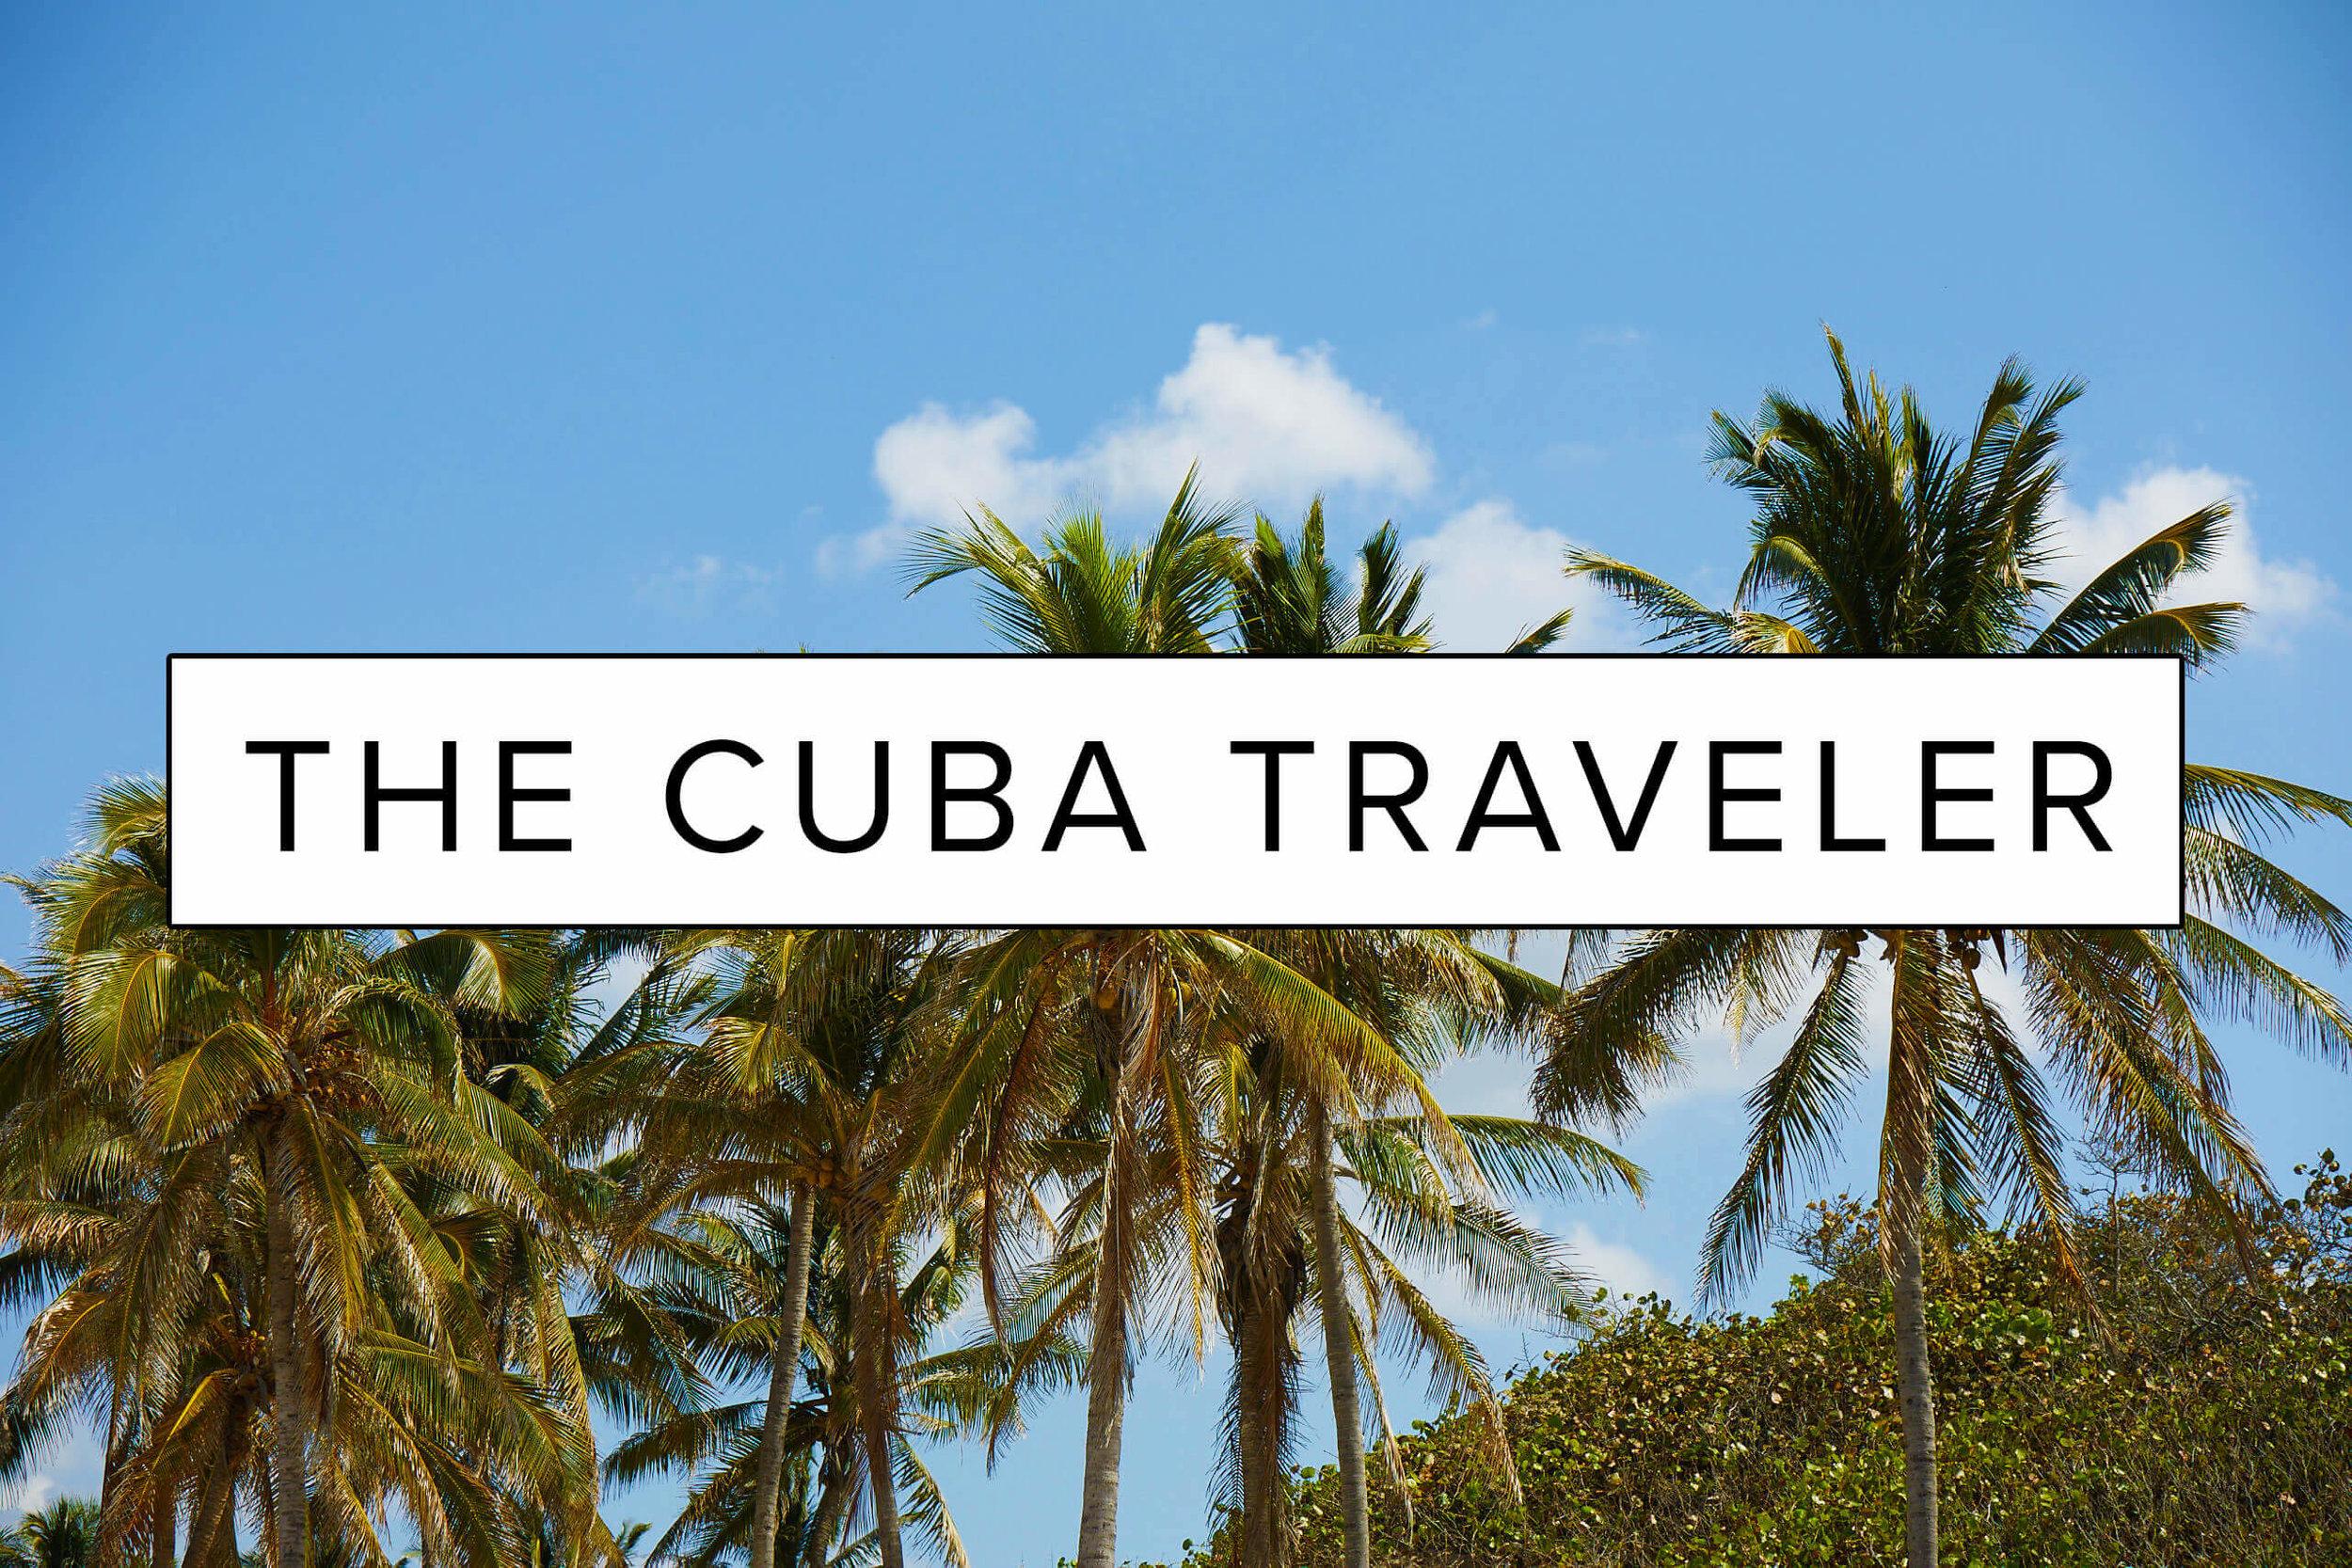 [compressed]_THE_CUBA_TRAVELER_Blog_tittle_image_1.jpg